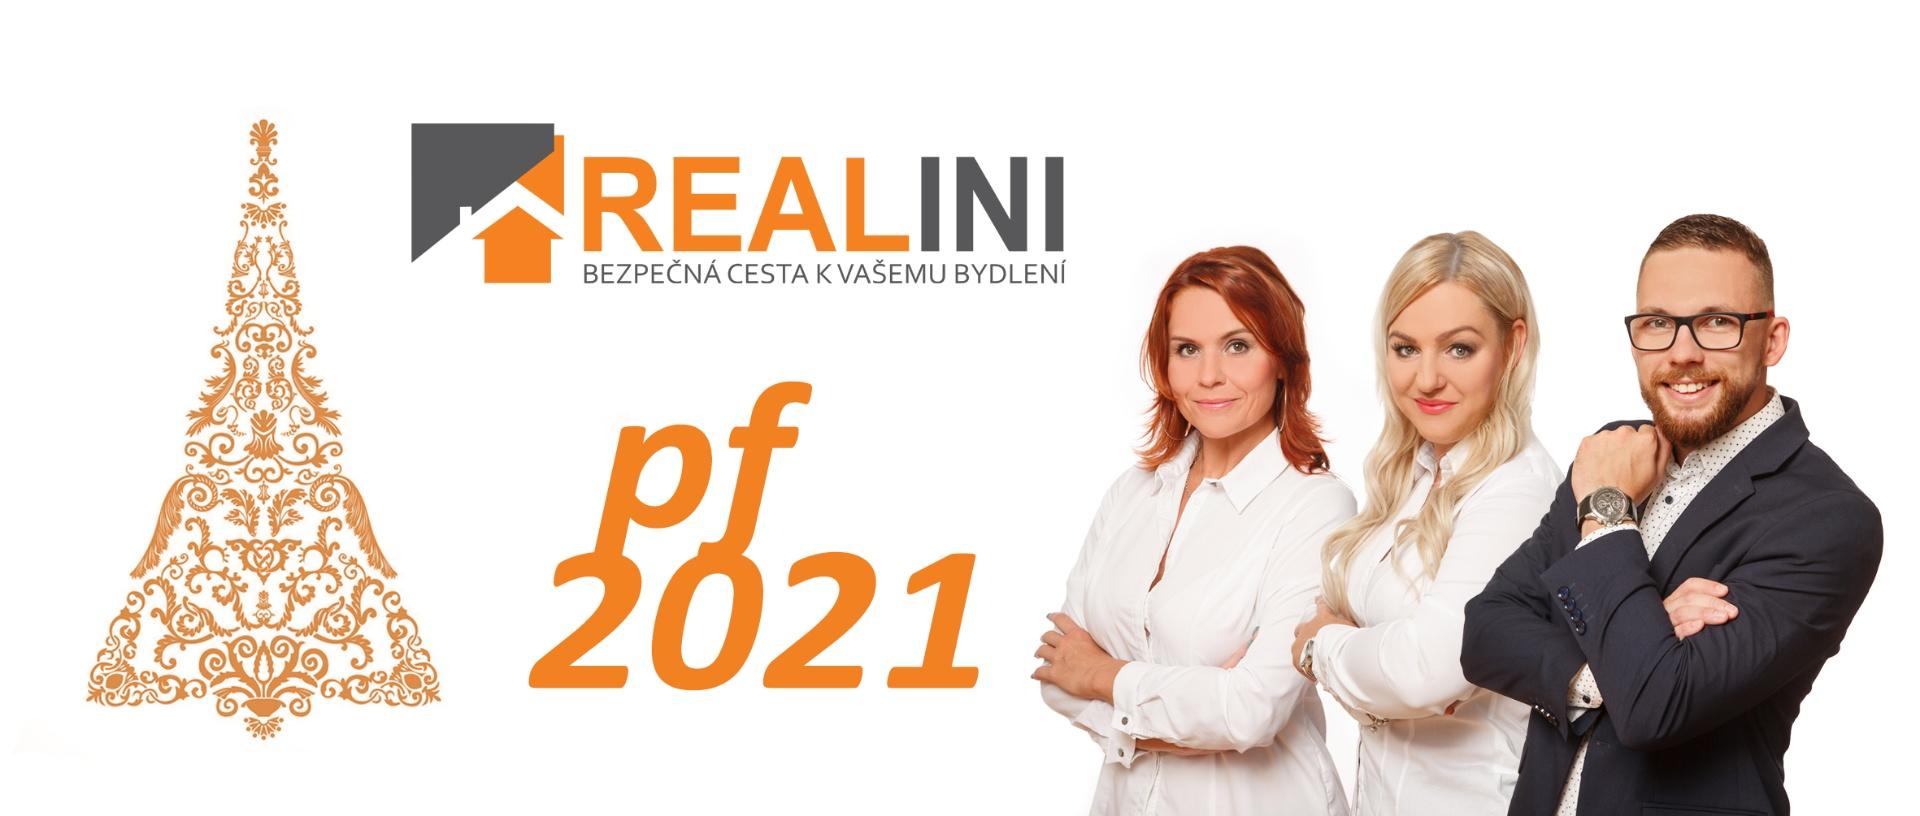 pf realini 2021